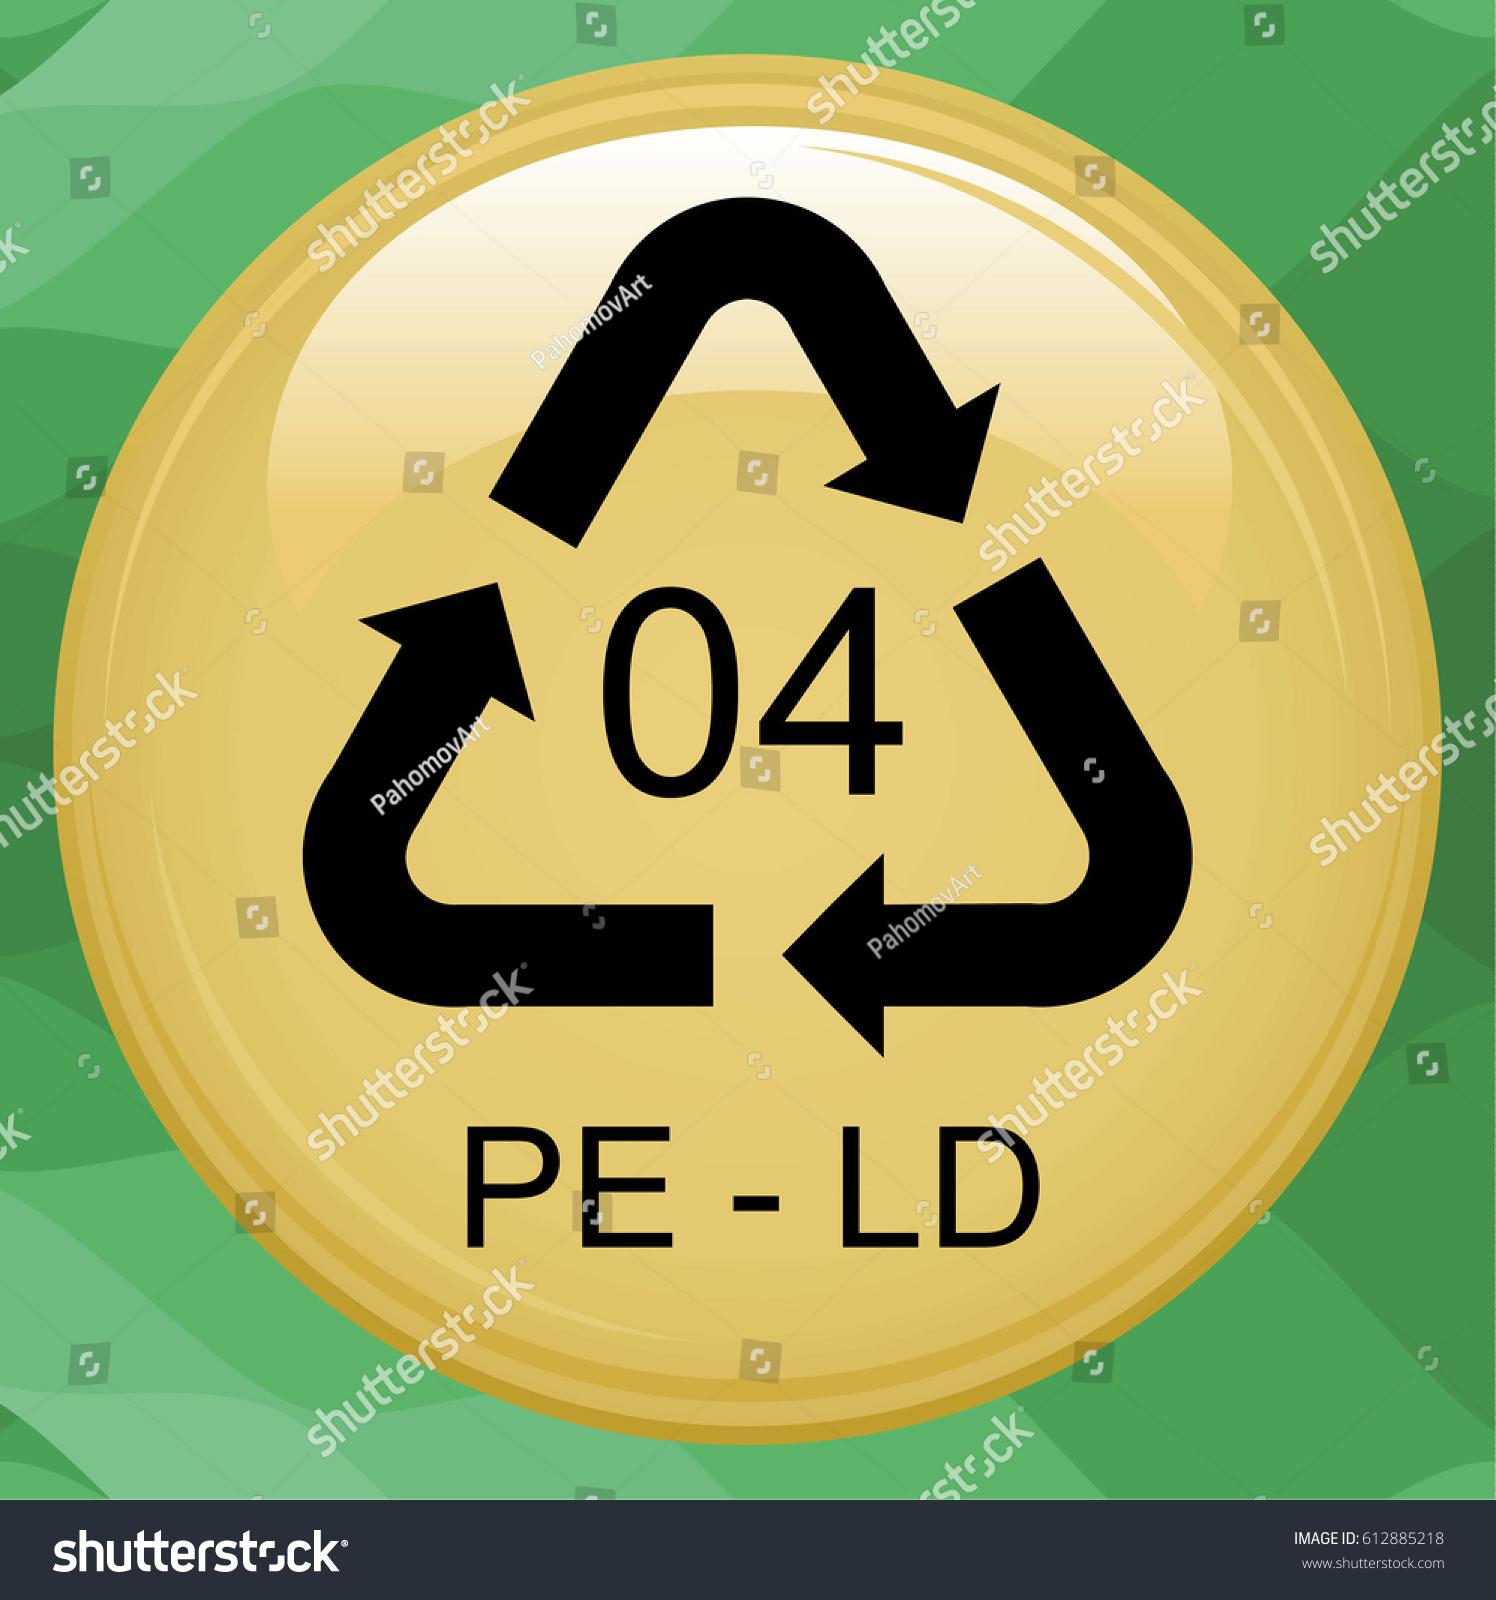 Ldpe 4 icon lowdensity polyethylene sign stock illustration ld pe 4 icon low density polyethylene sign recycling symbol flat biocorpaavc Choice Image